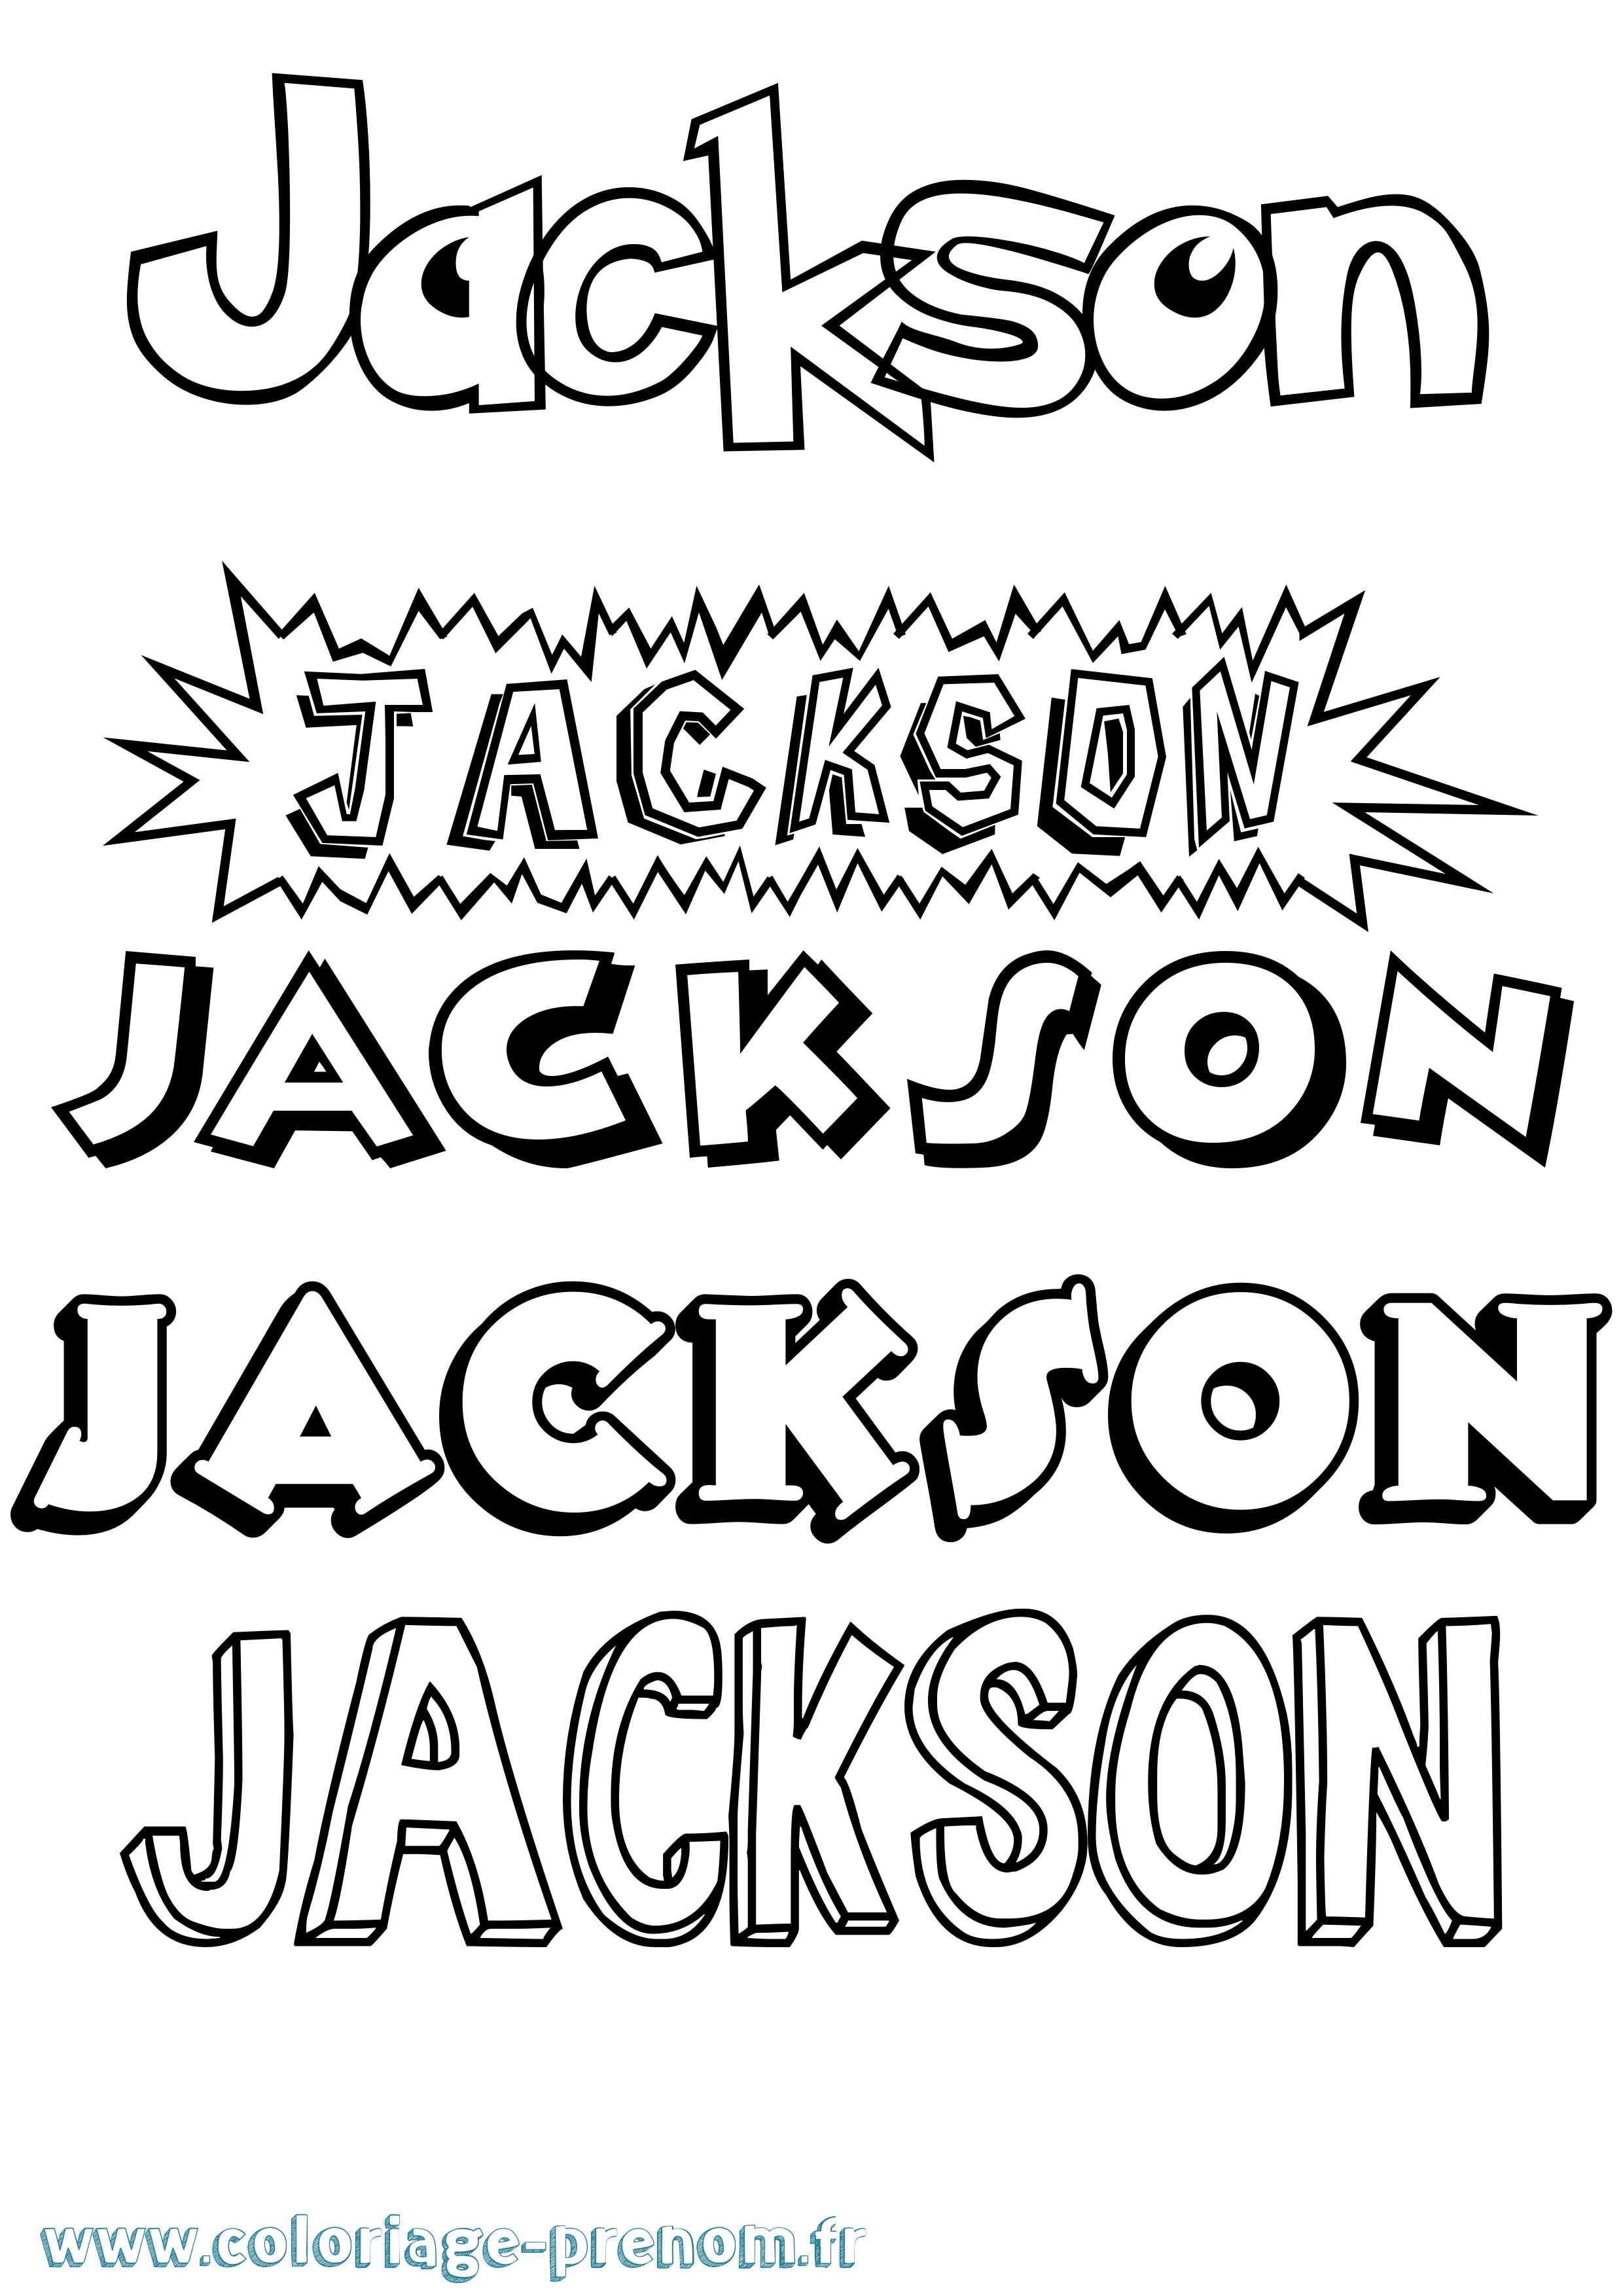 Coloriage jackson - Coloriage michael jackson ...